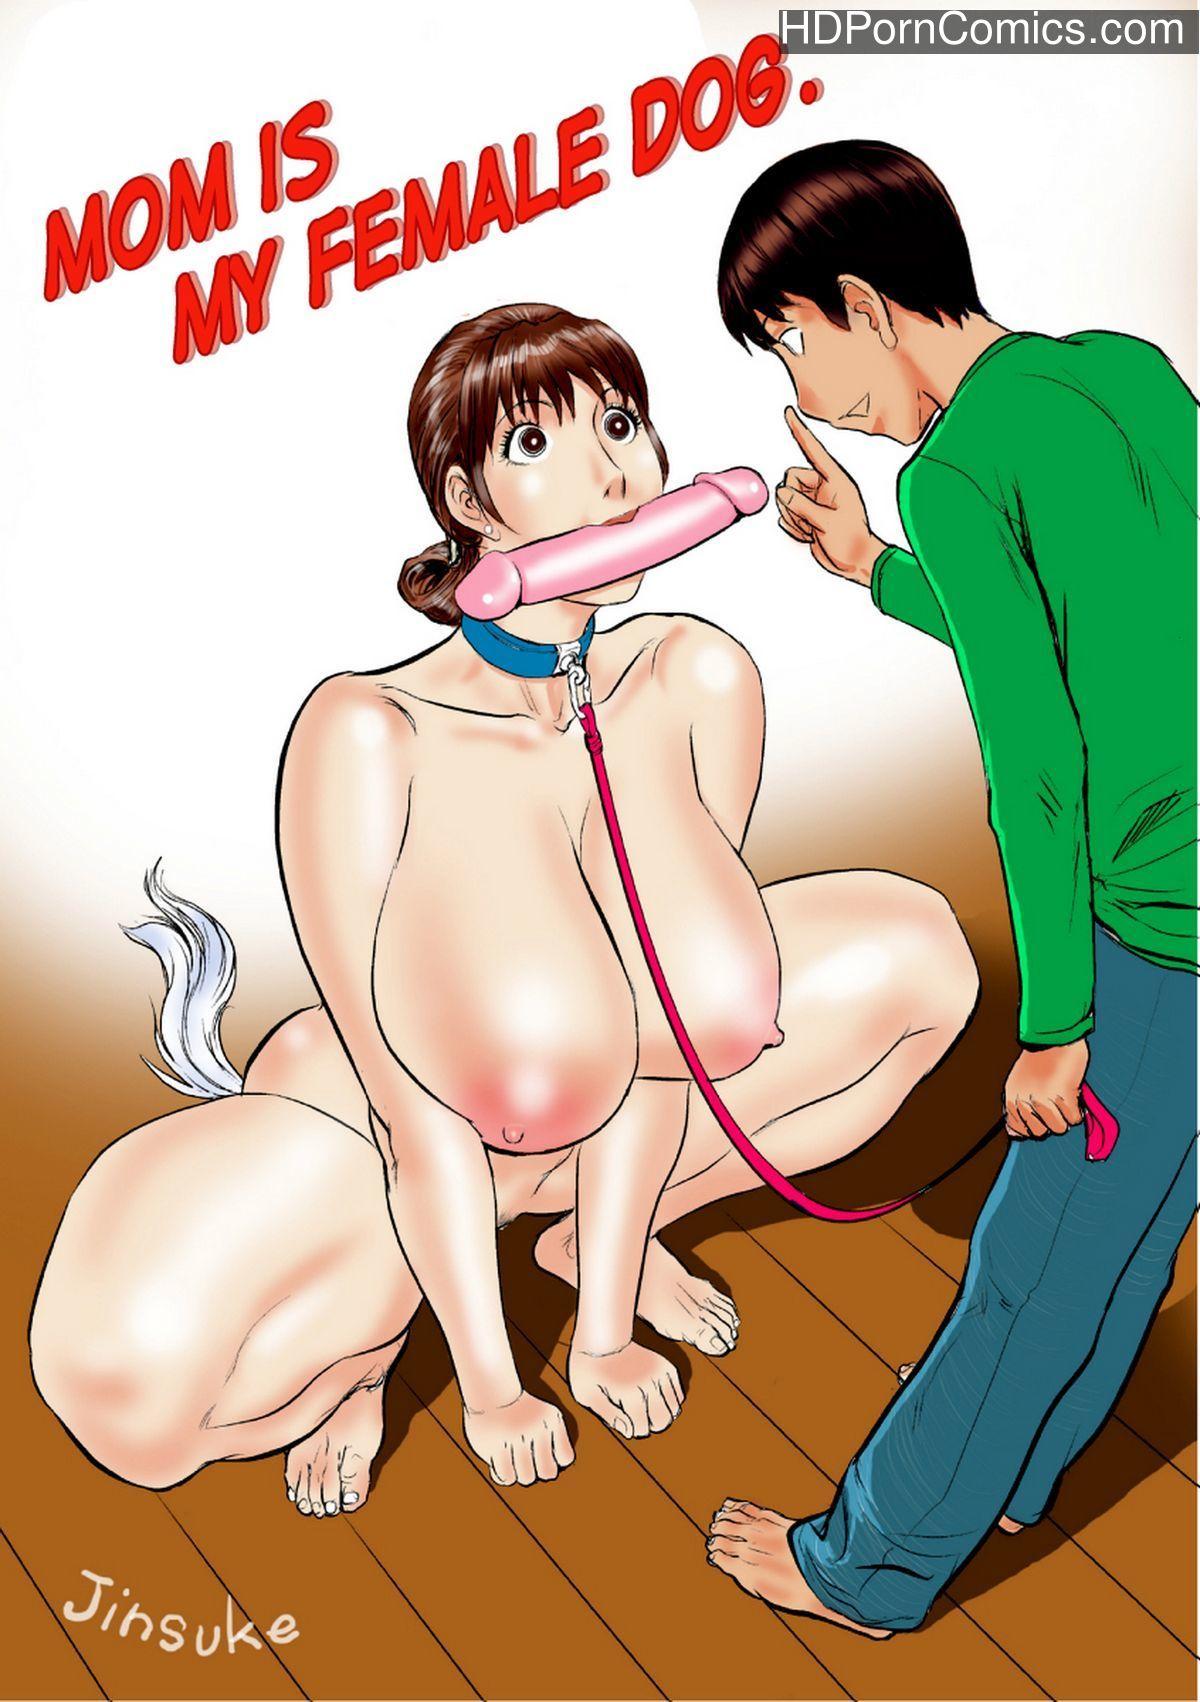 mother comic sex